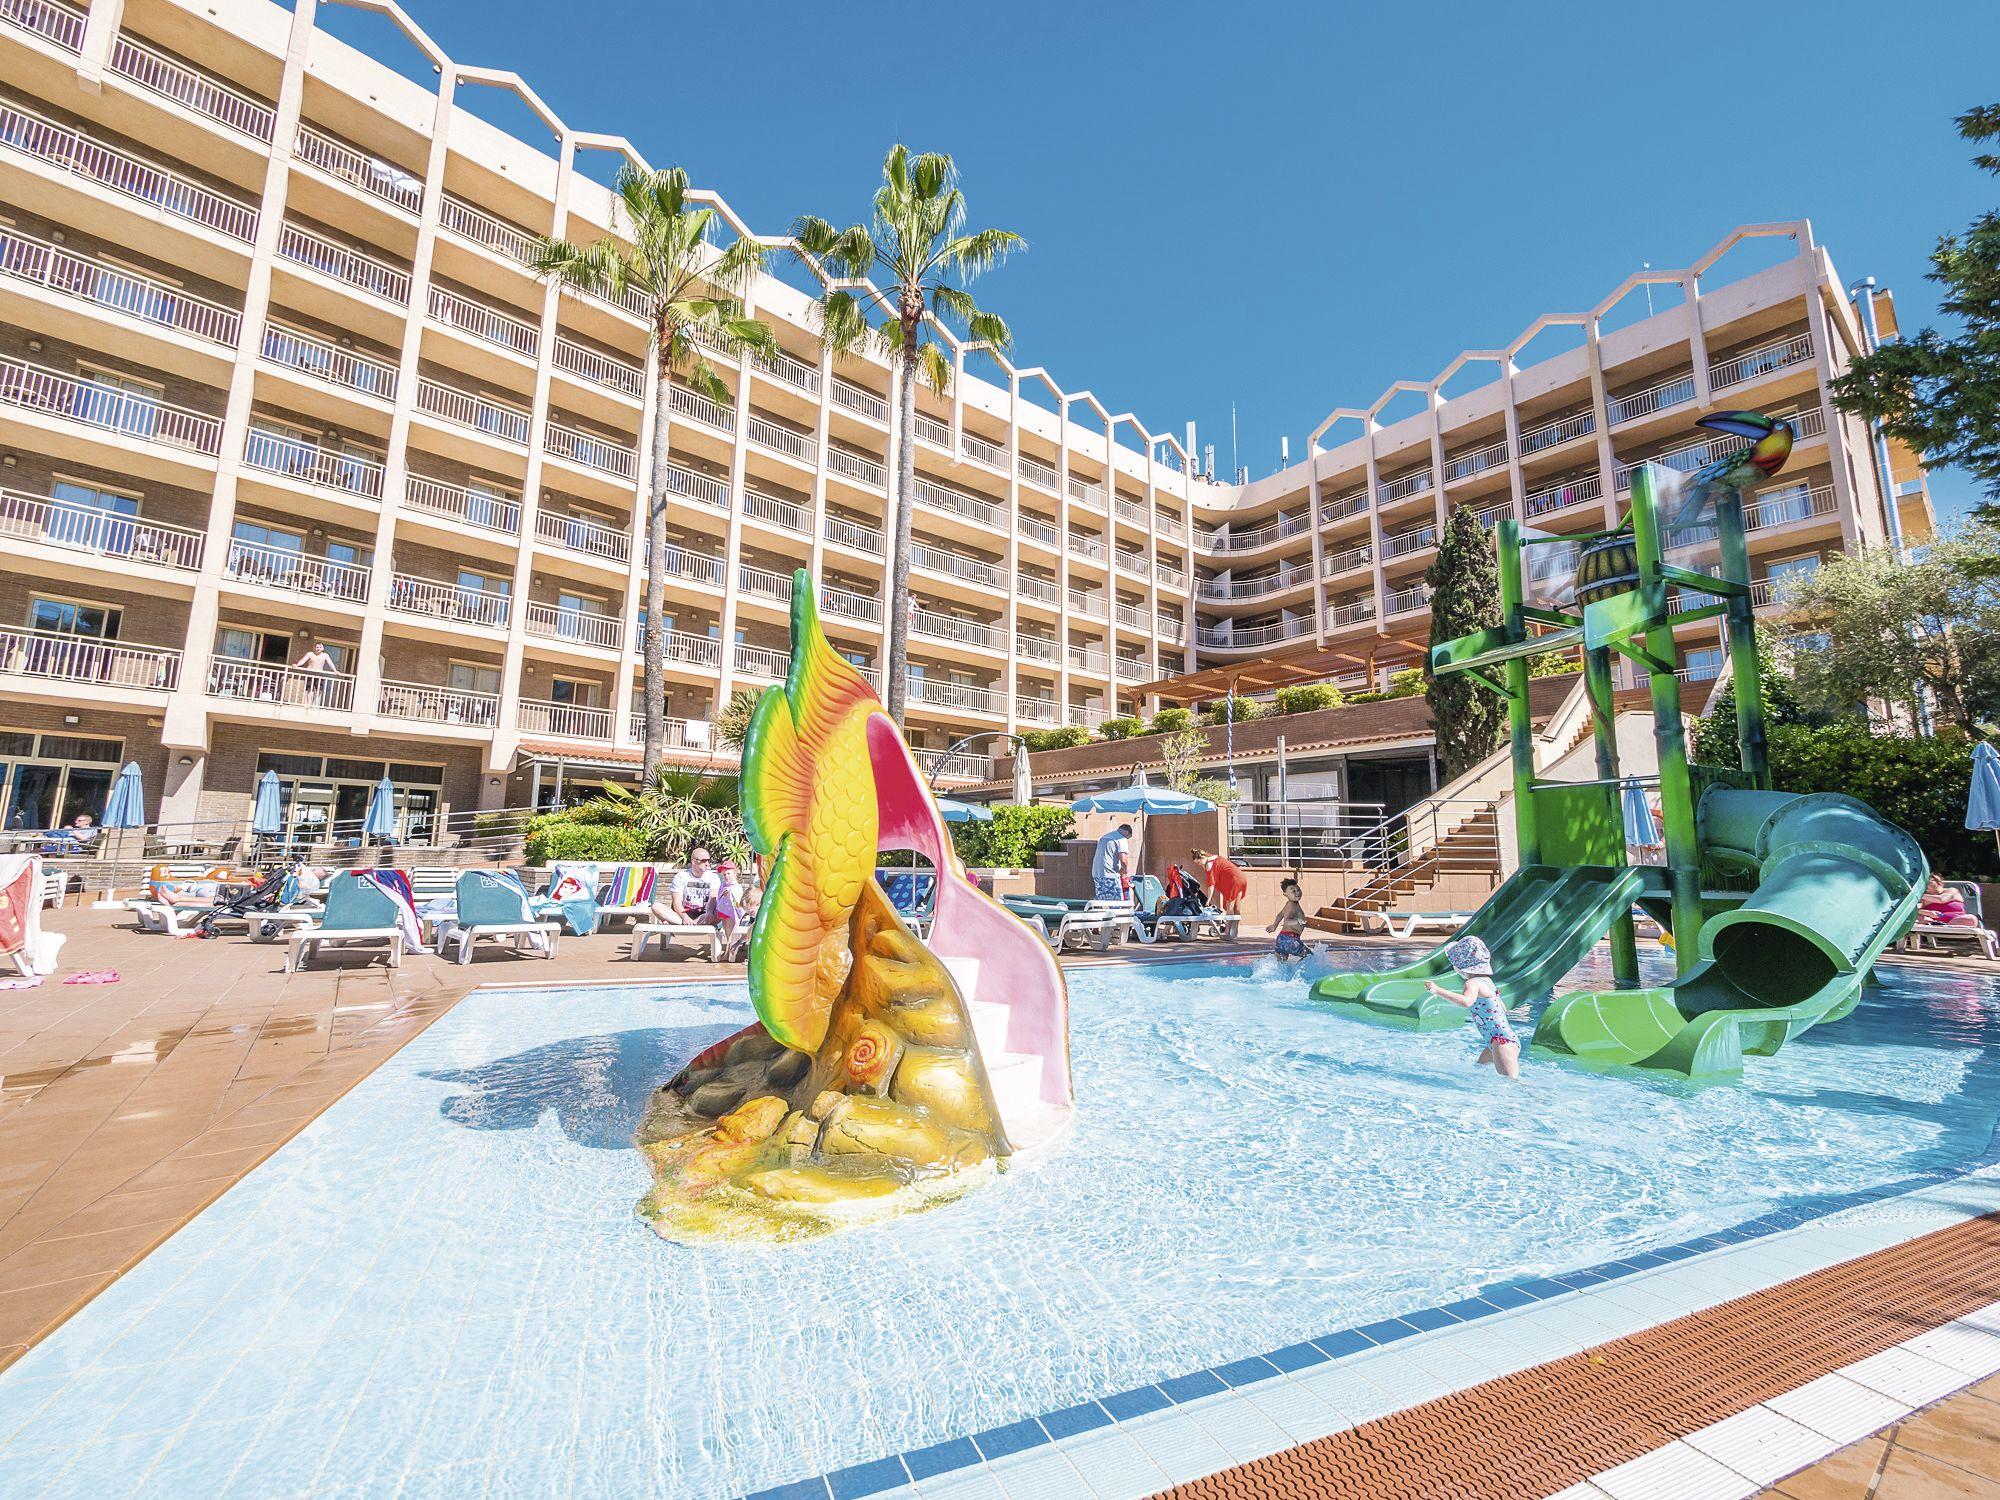 Tui Hotel Playa Parc Menorca